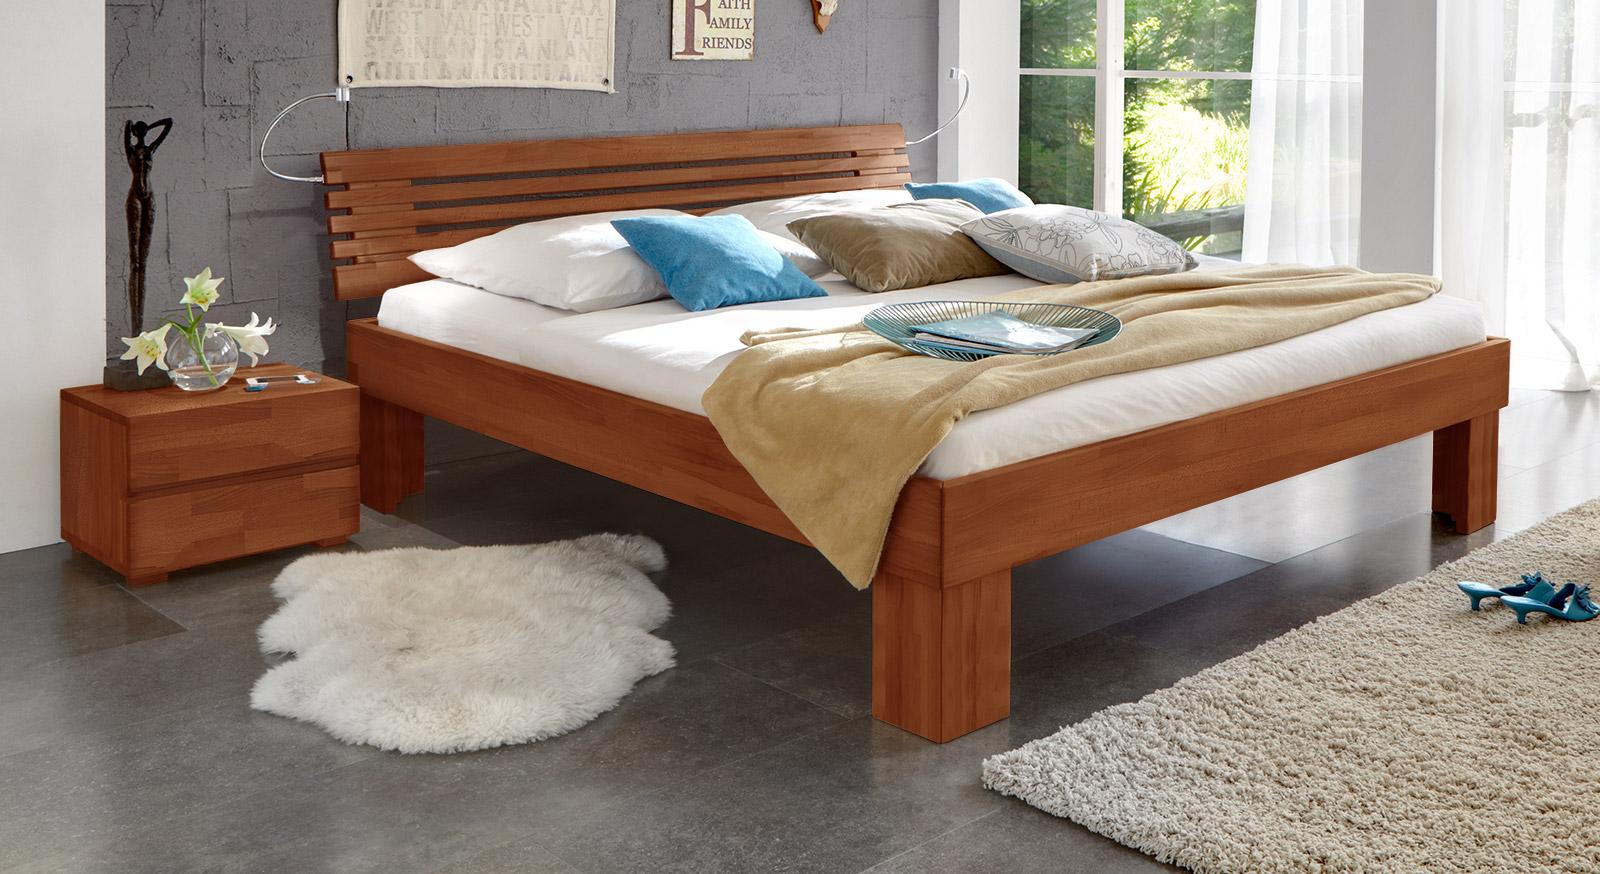 Massivholzbett Wood Romance in kirschbaumfarben 30cm.